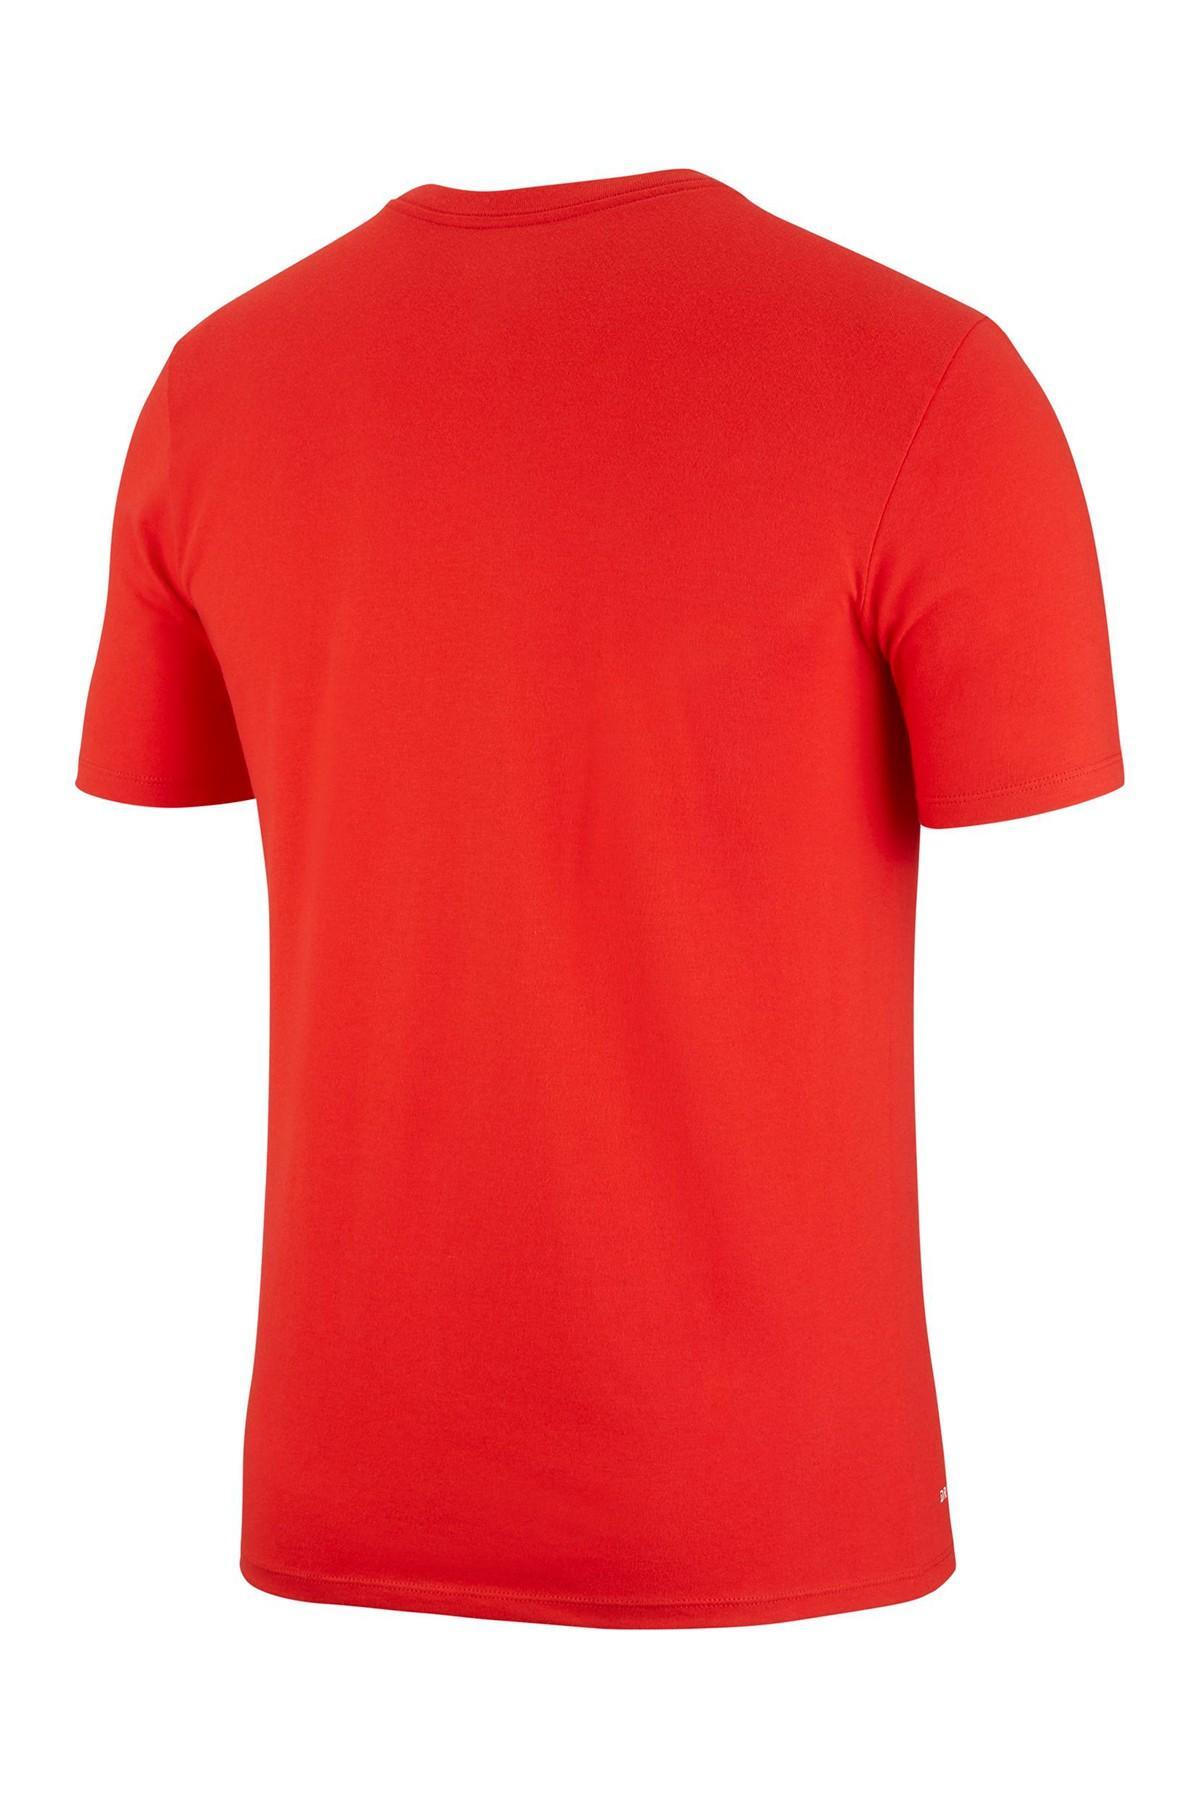 8c870c657ca Nike - Red Basketball Stats Dri-fit Tee for Men - Lyst. View fullscreen